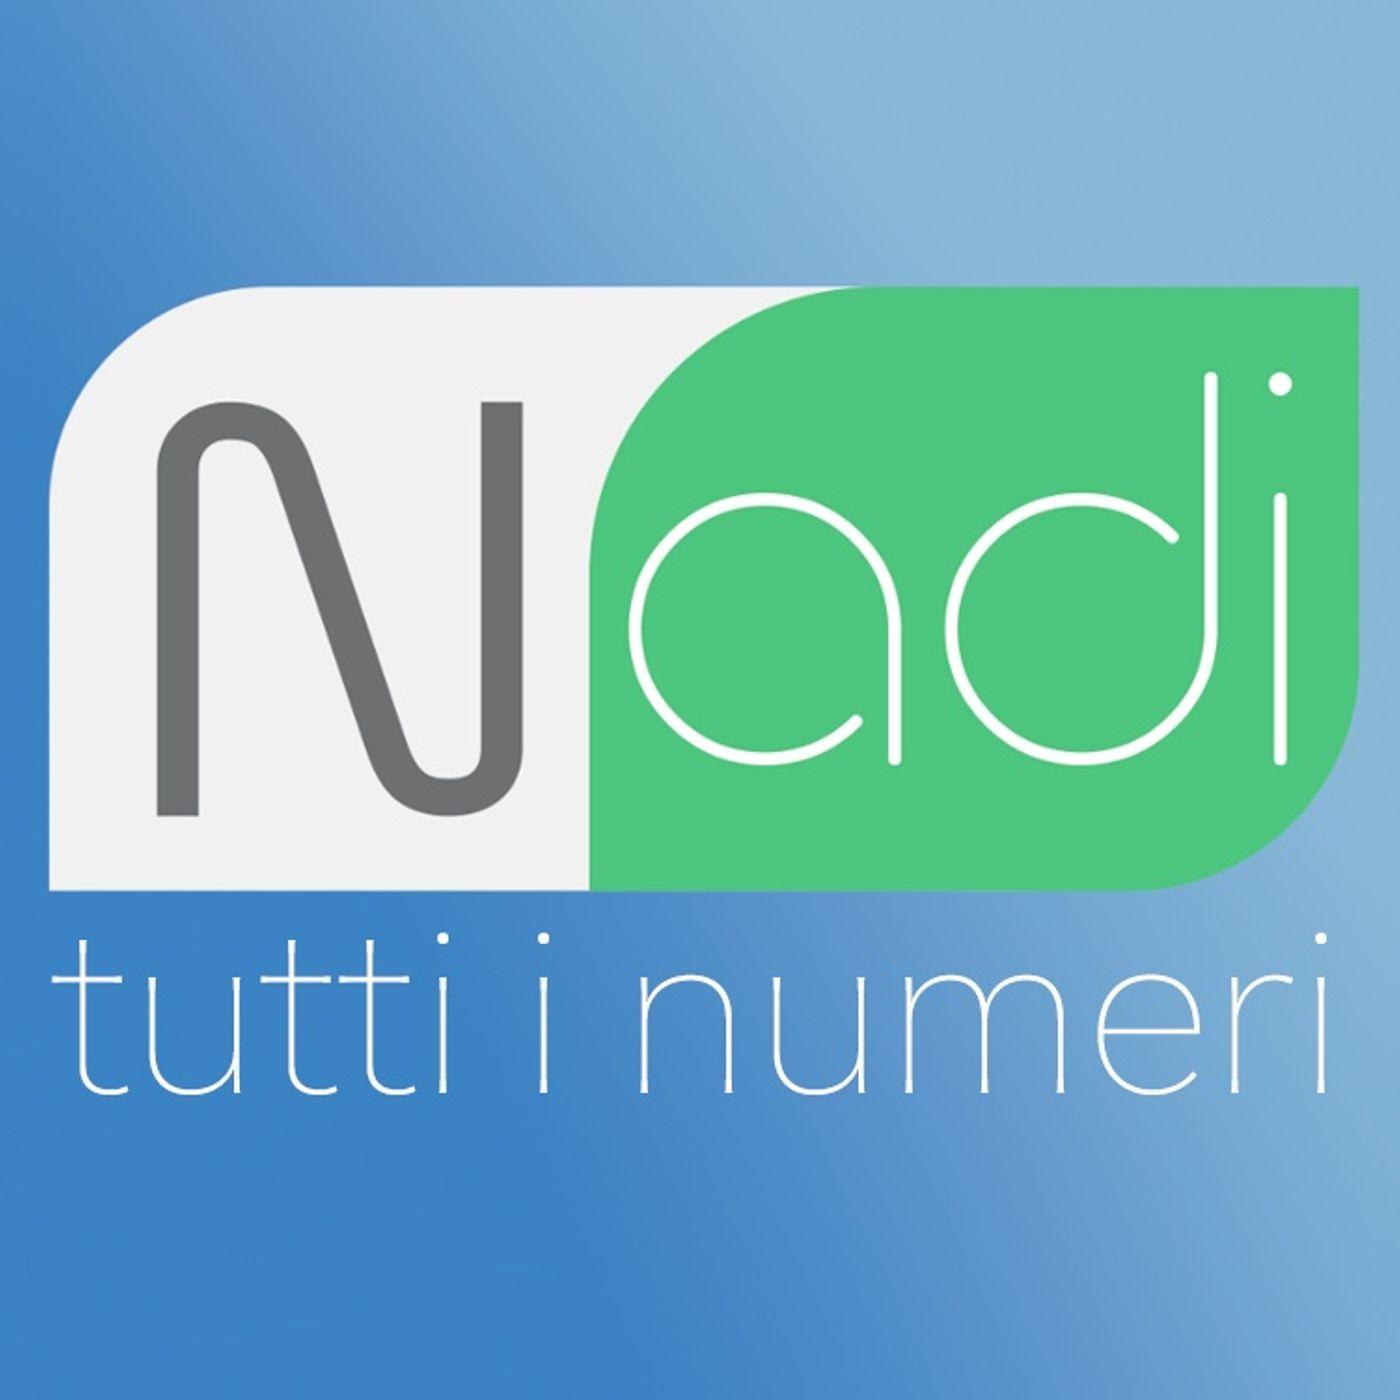 Notiziario ADI - Tutti i numeri